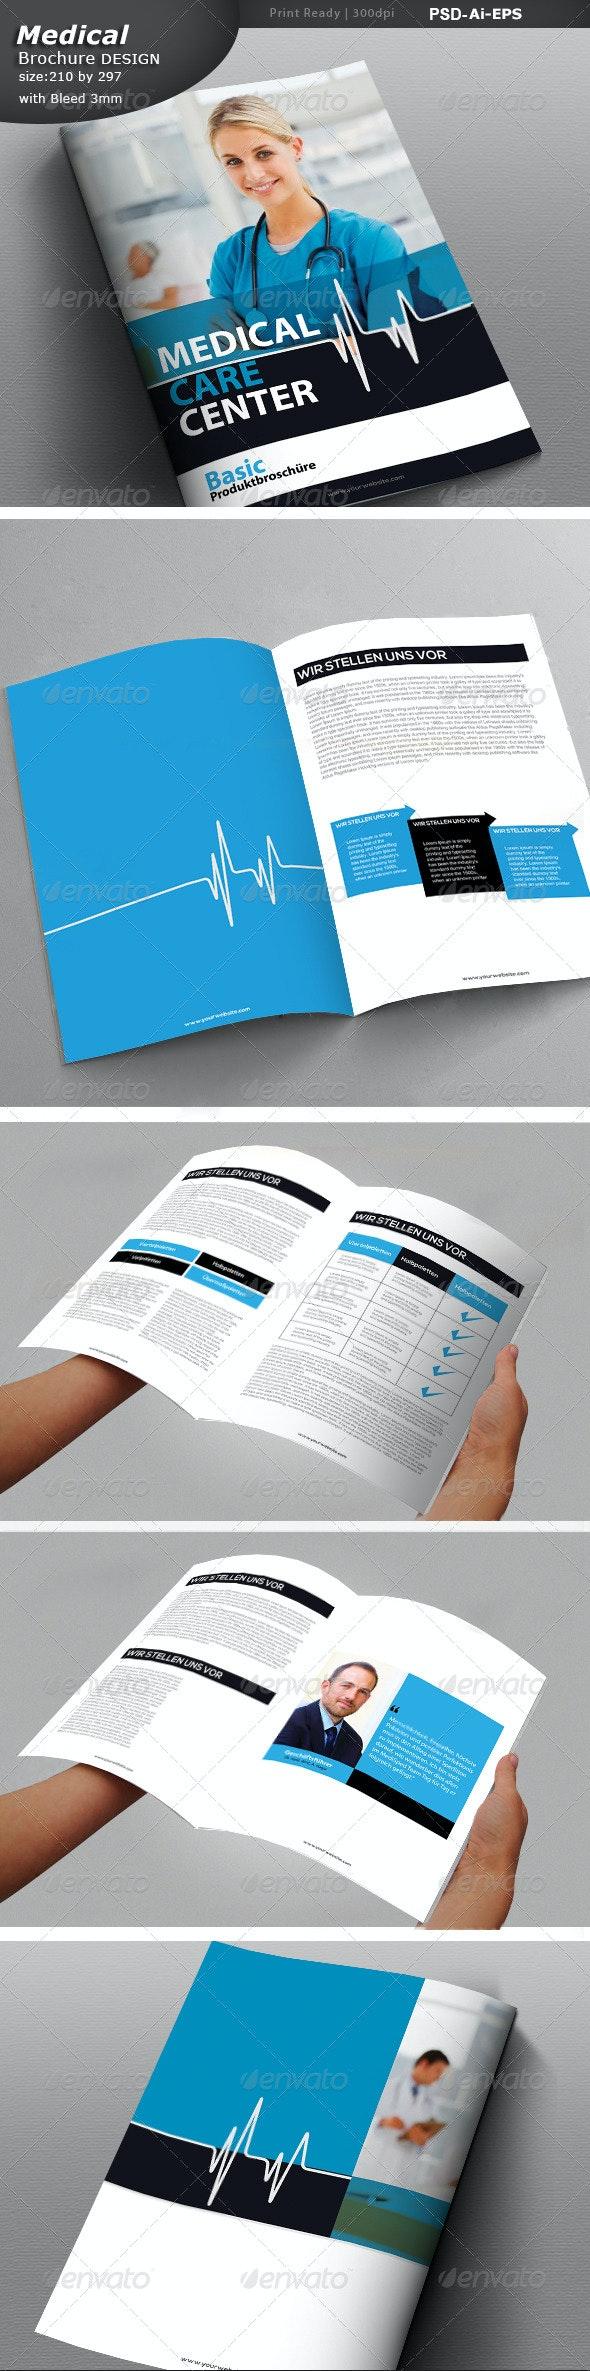 Medical Center Brochure Design  - Print Templates